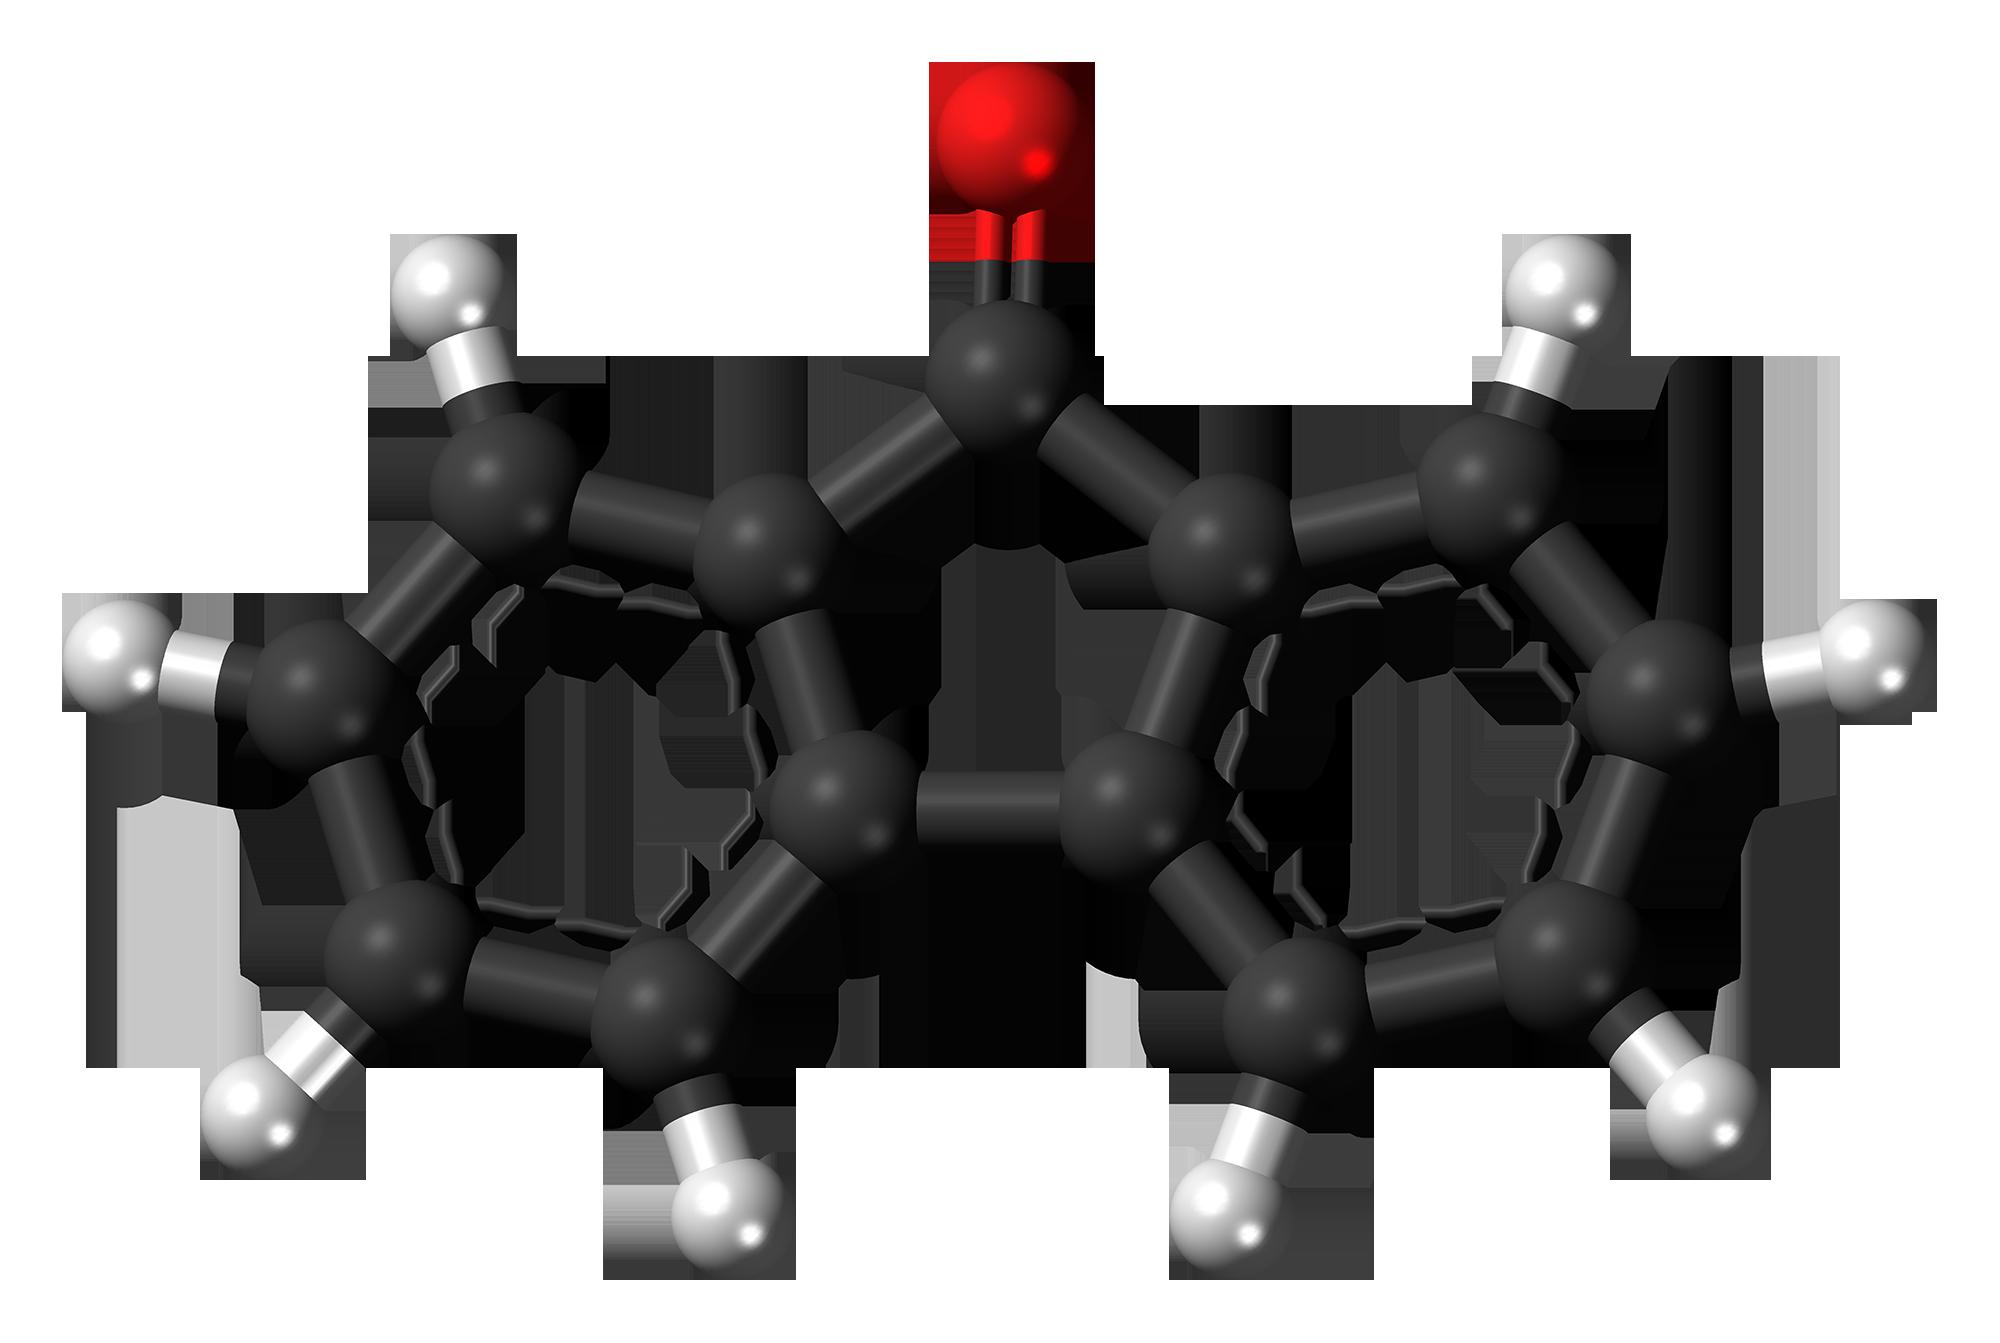 fluorenone melting point